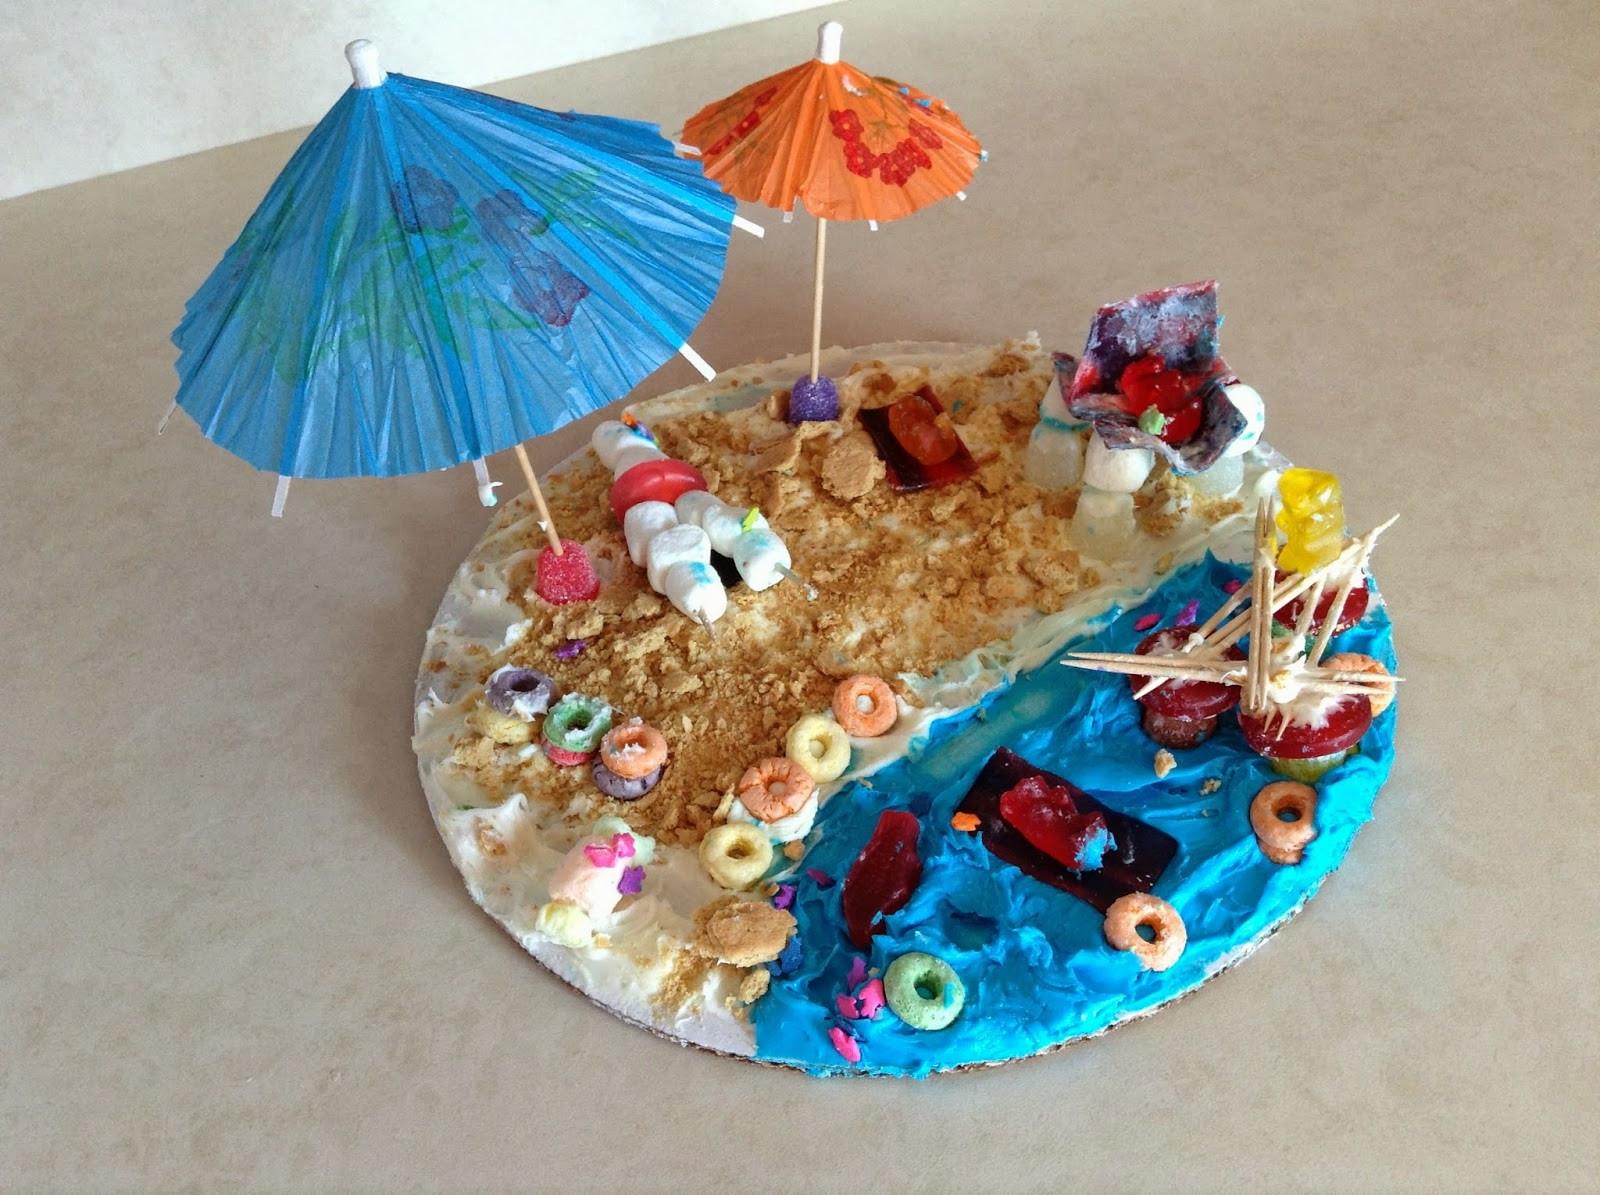 Preschool Arts And Crafts Ideas  Holly s Arts and Crafts Corner Summer Recap Independent